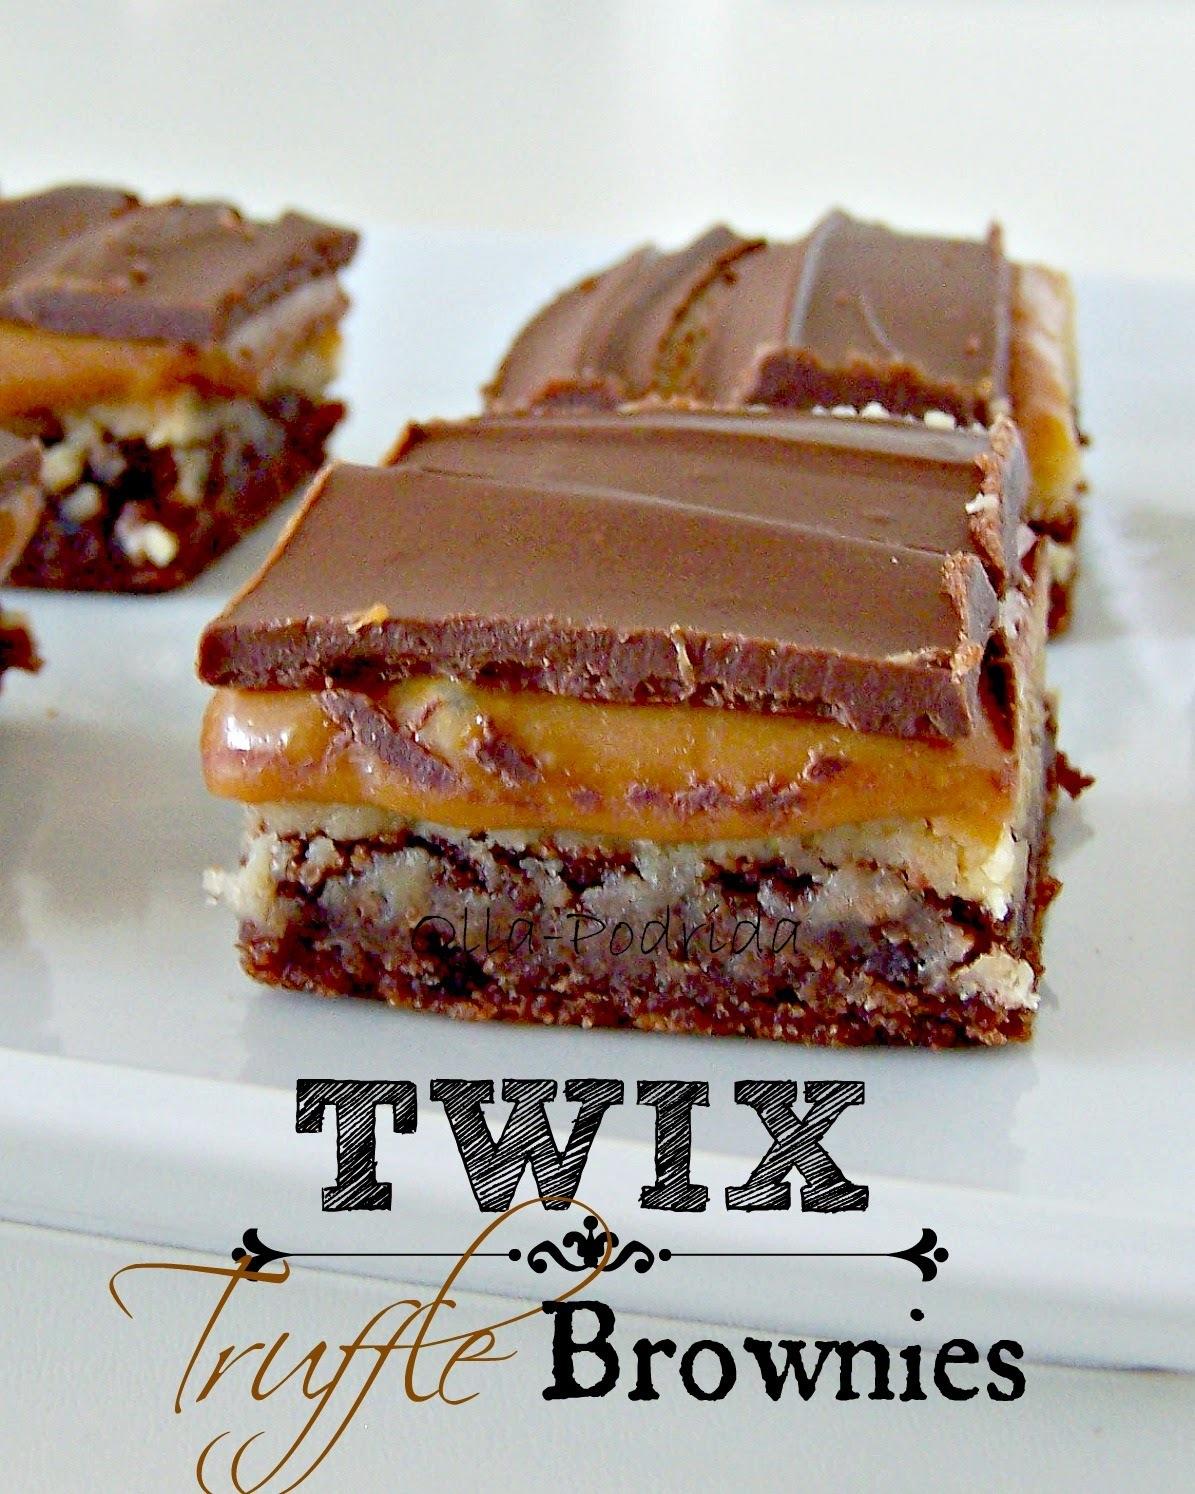 Twix Truffle Brownies